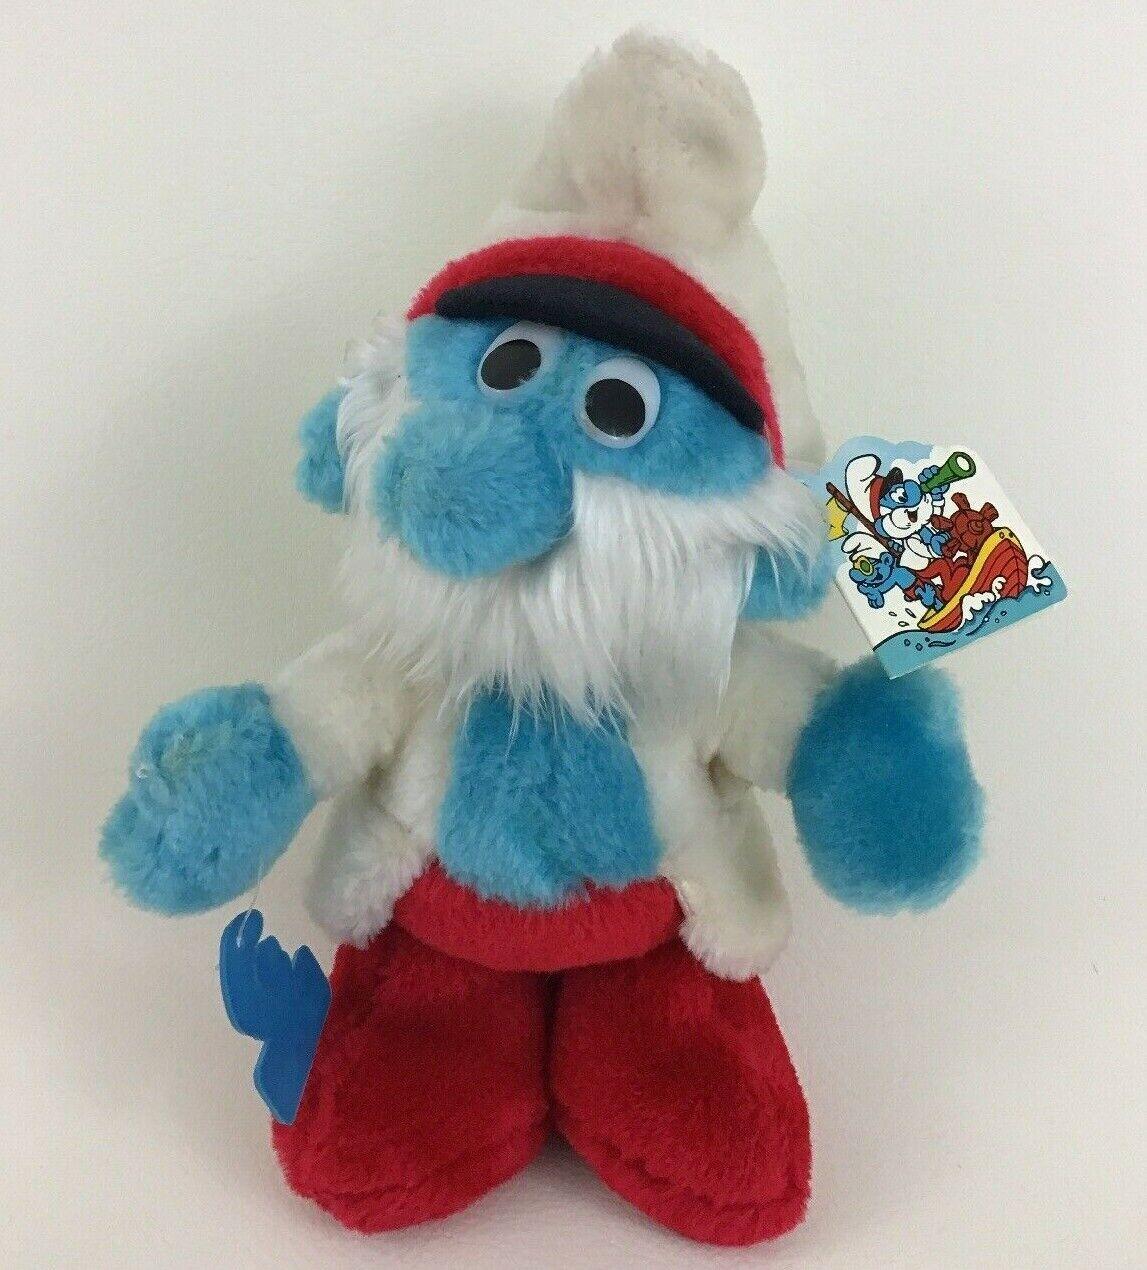 Vintage Sea Captain Papa Smurf 10  Plush Plush Plush Toy Wallace Berrie Peyo 1983 with Tags 07971b